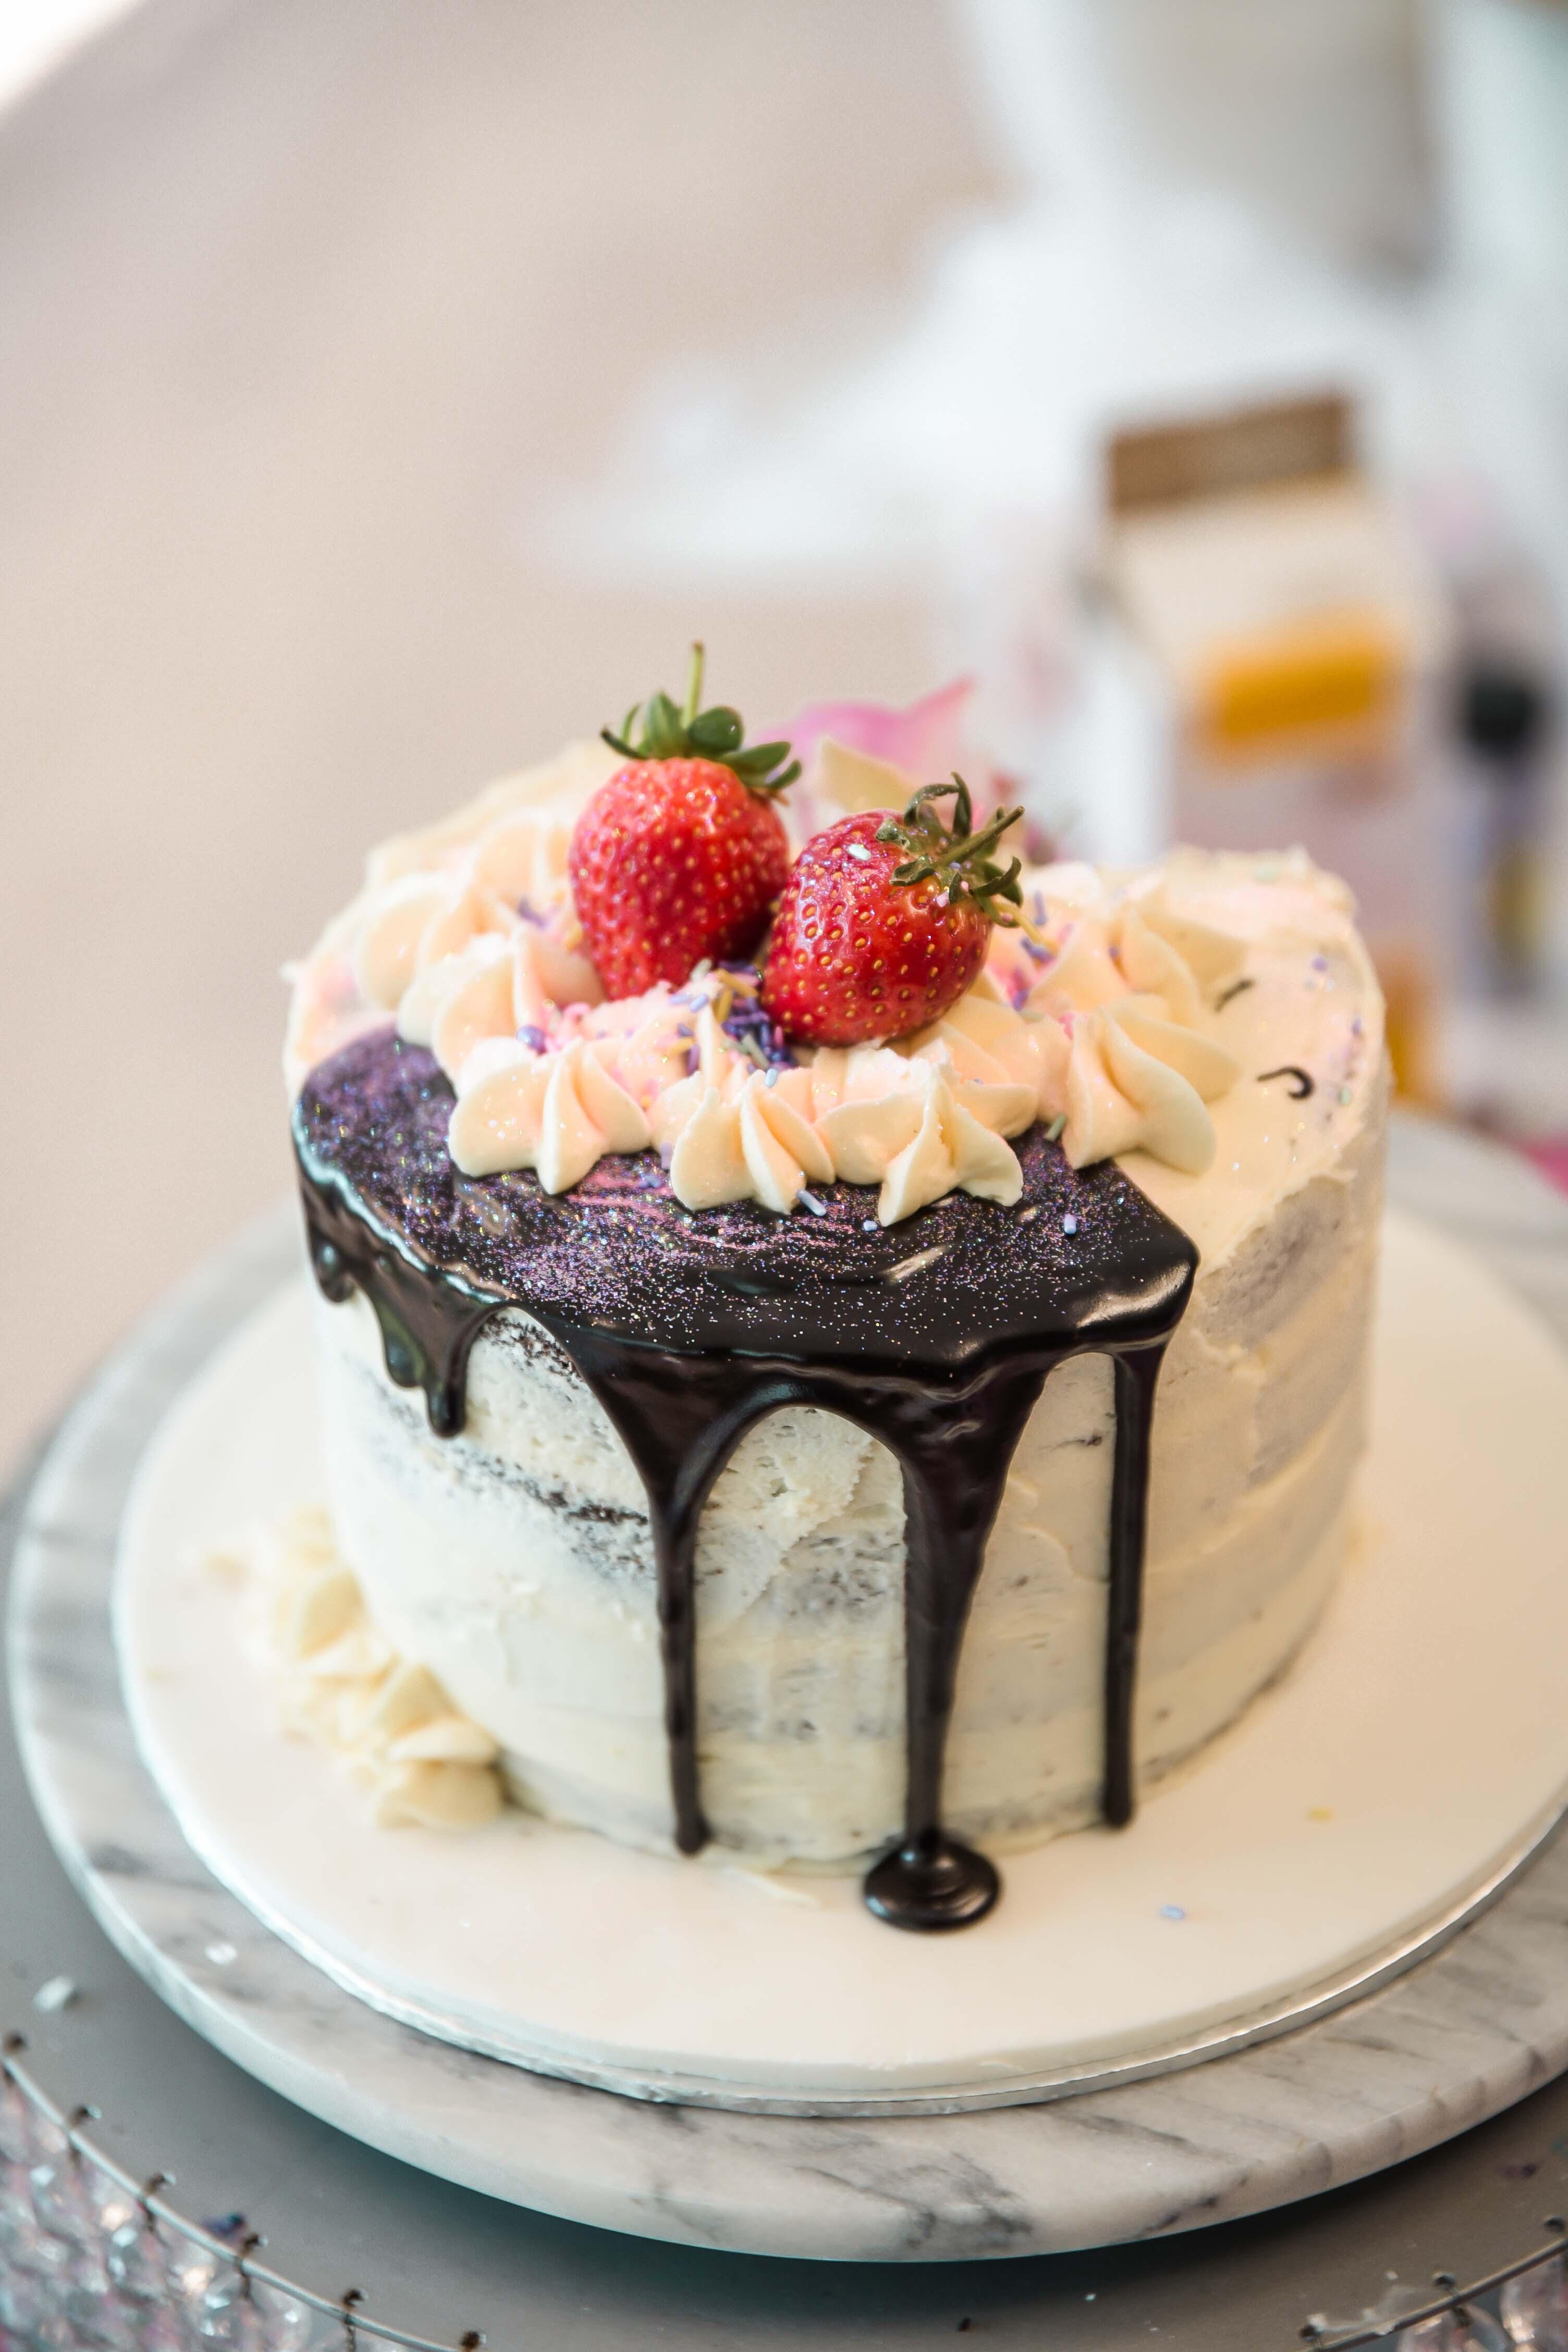 Workshop cakes